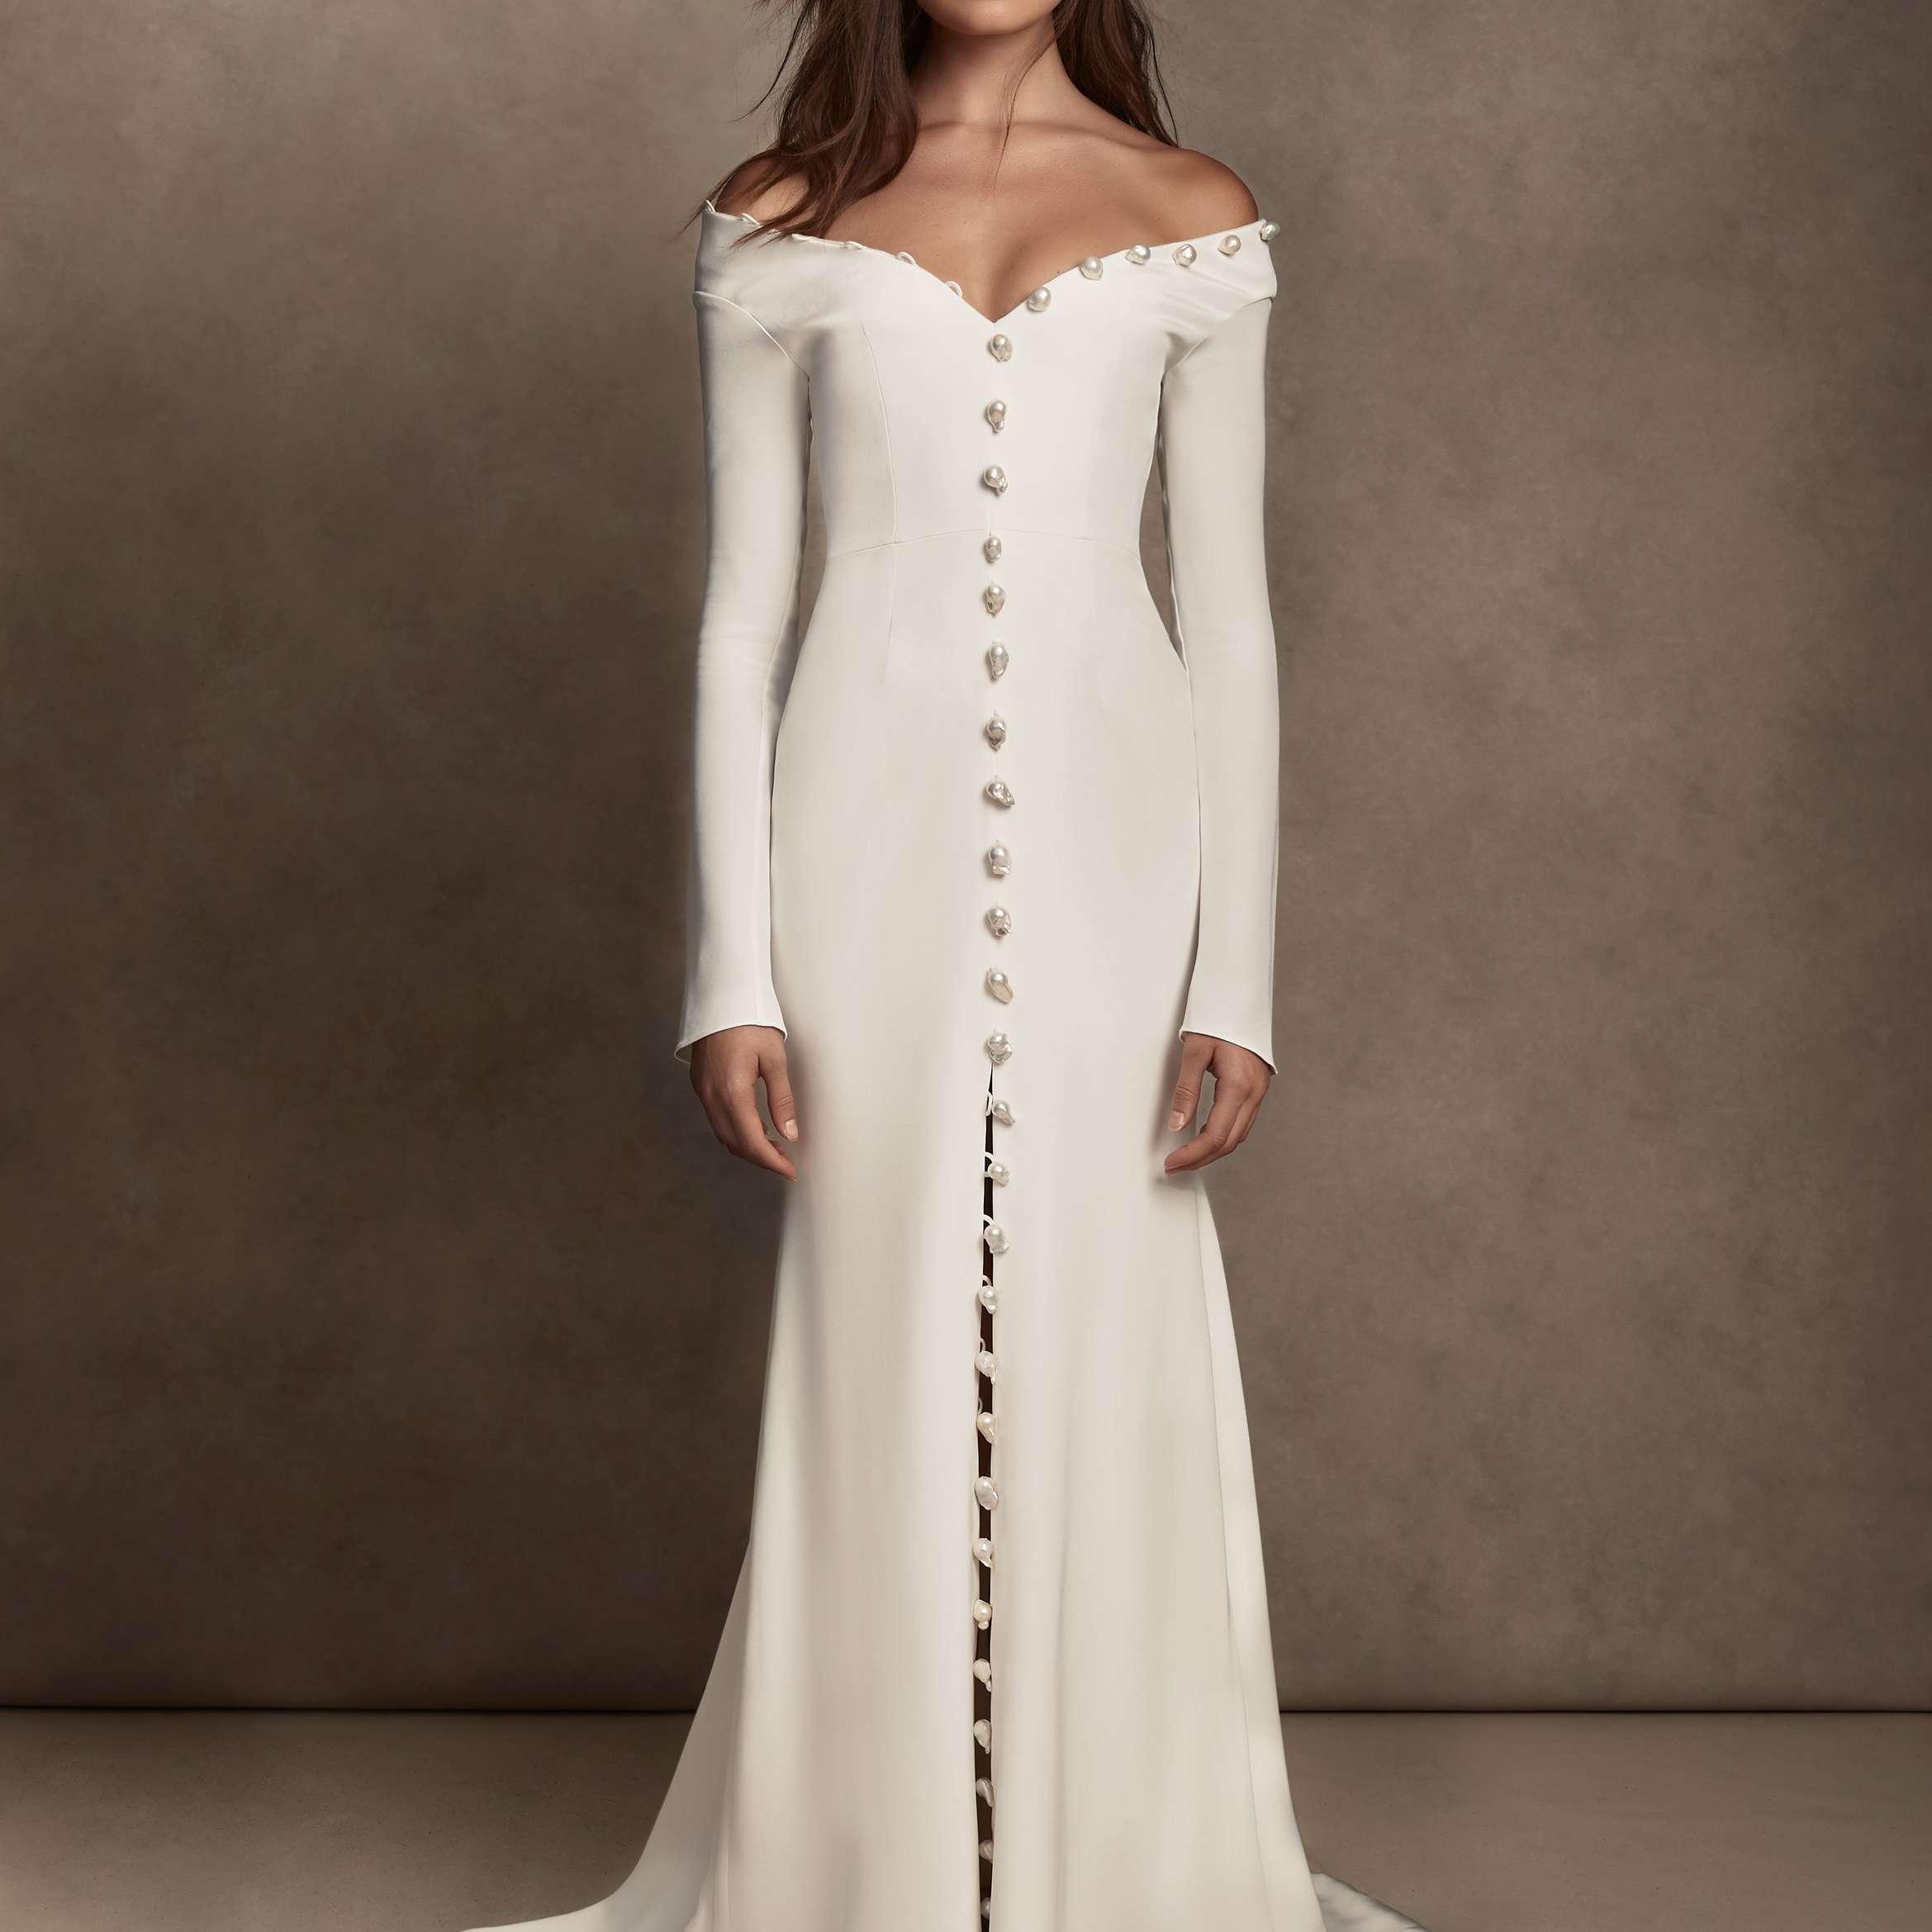 Danielle Frankel Sloane Wedding Gown